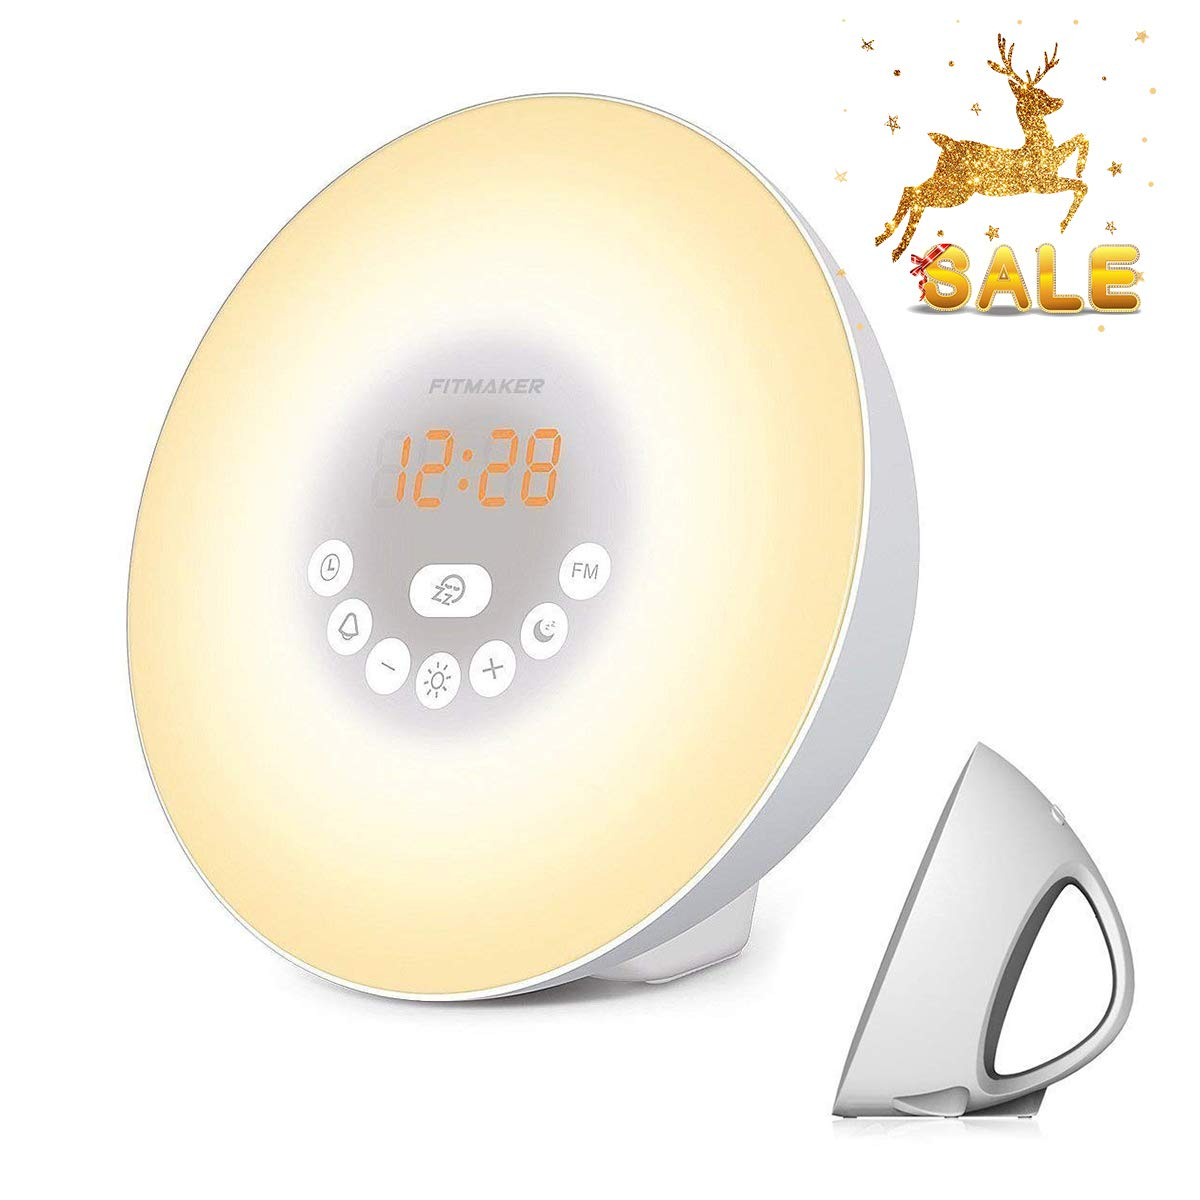 YOUSMART F6640 Sunrise Alarm Clock, Wake Up Light with 6 Nature Sounds, FM Radio, Color Light, Bedside Sunrise Simulator (New-White)